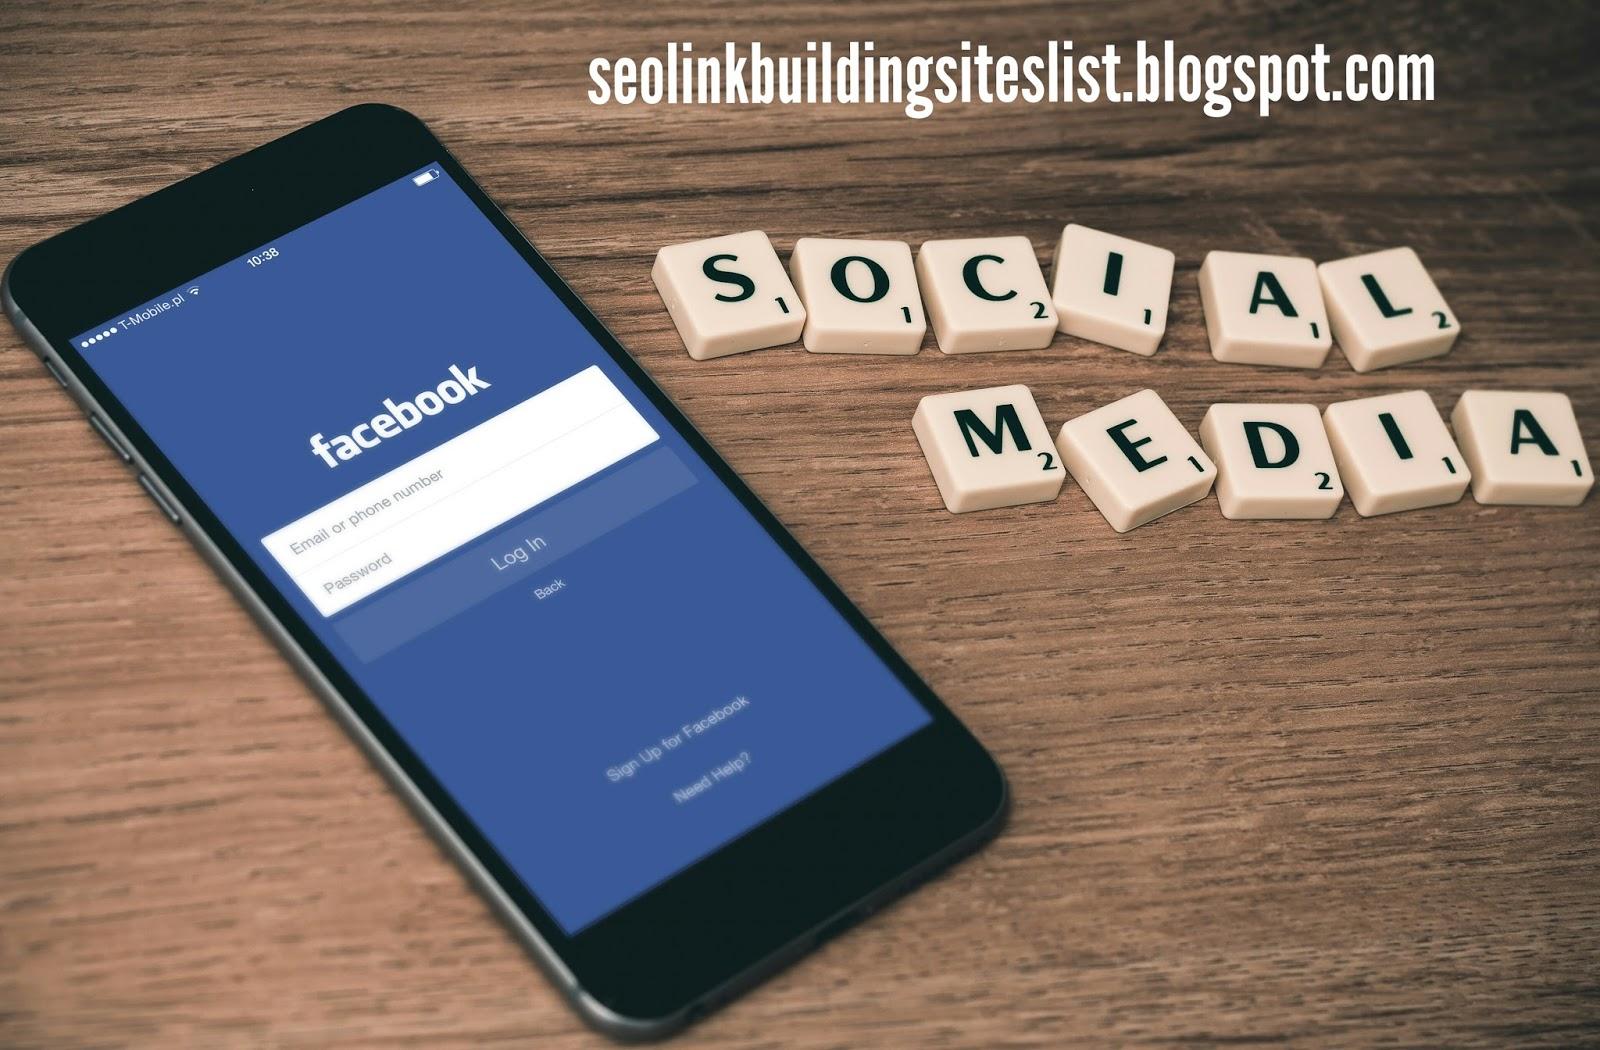 20 Most Popular Social Media Websites20 Most Popular Social Media Websites